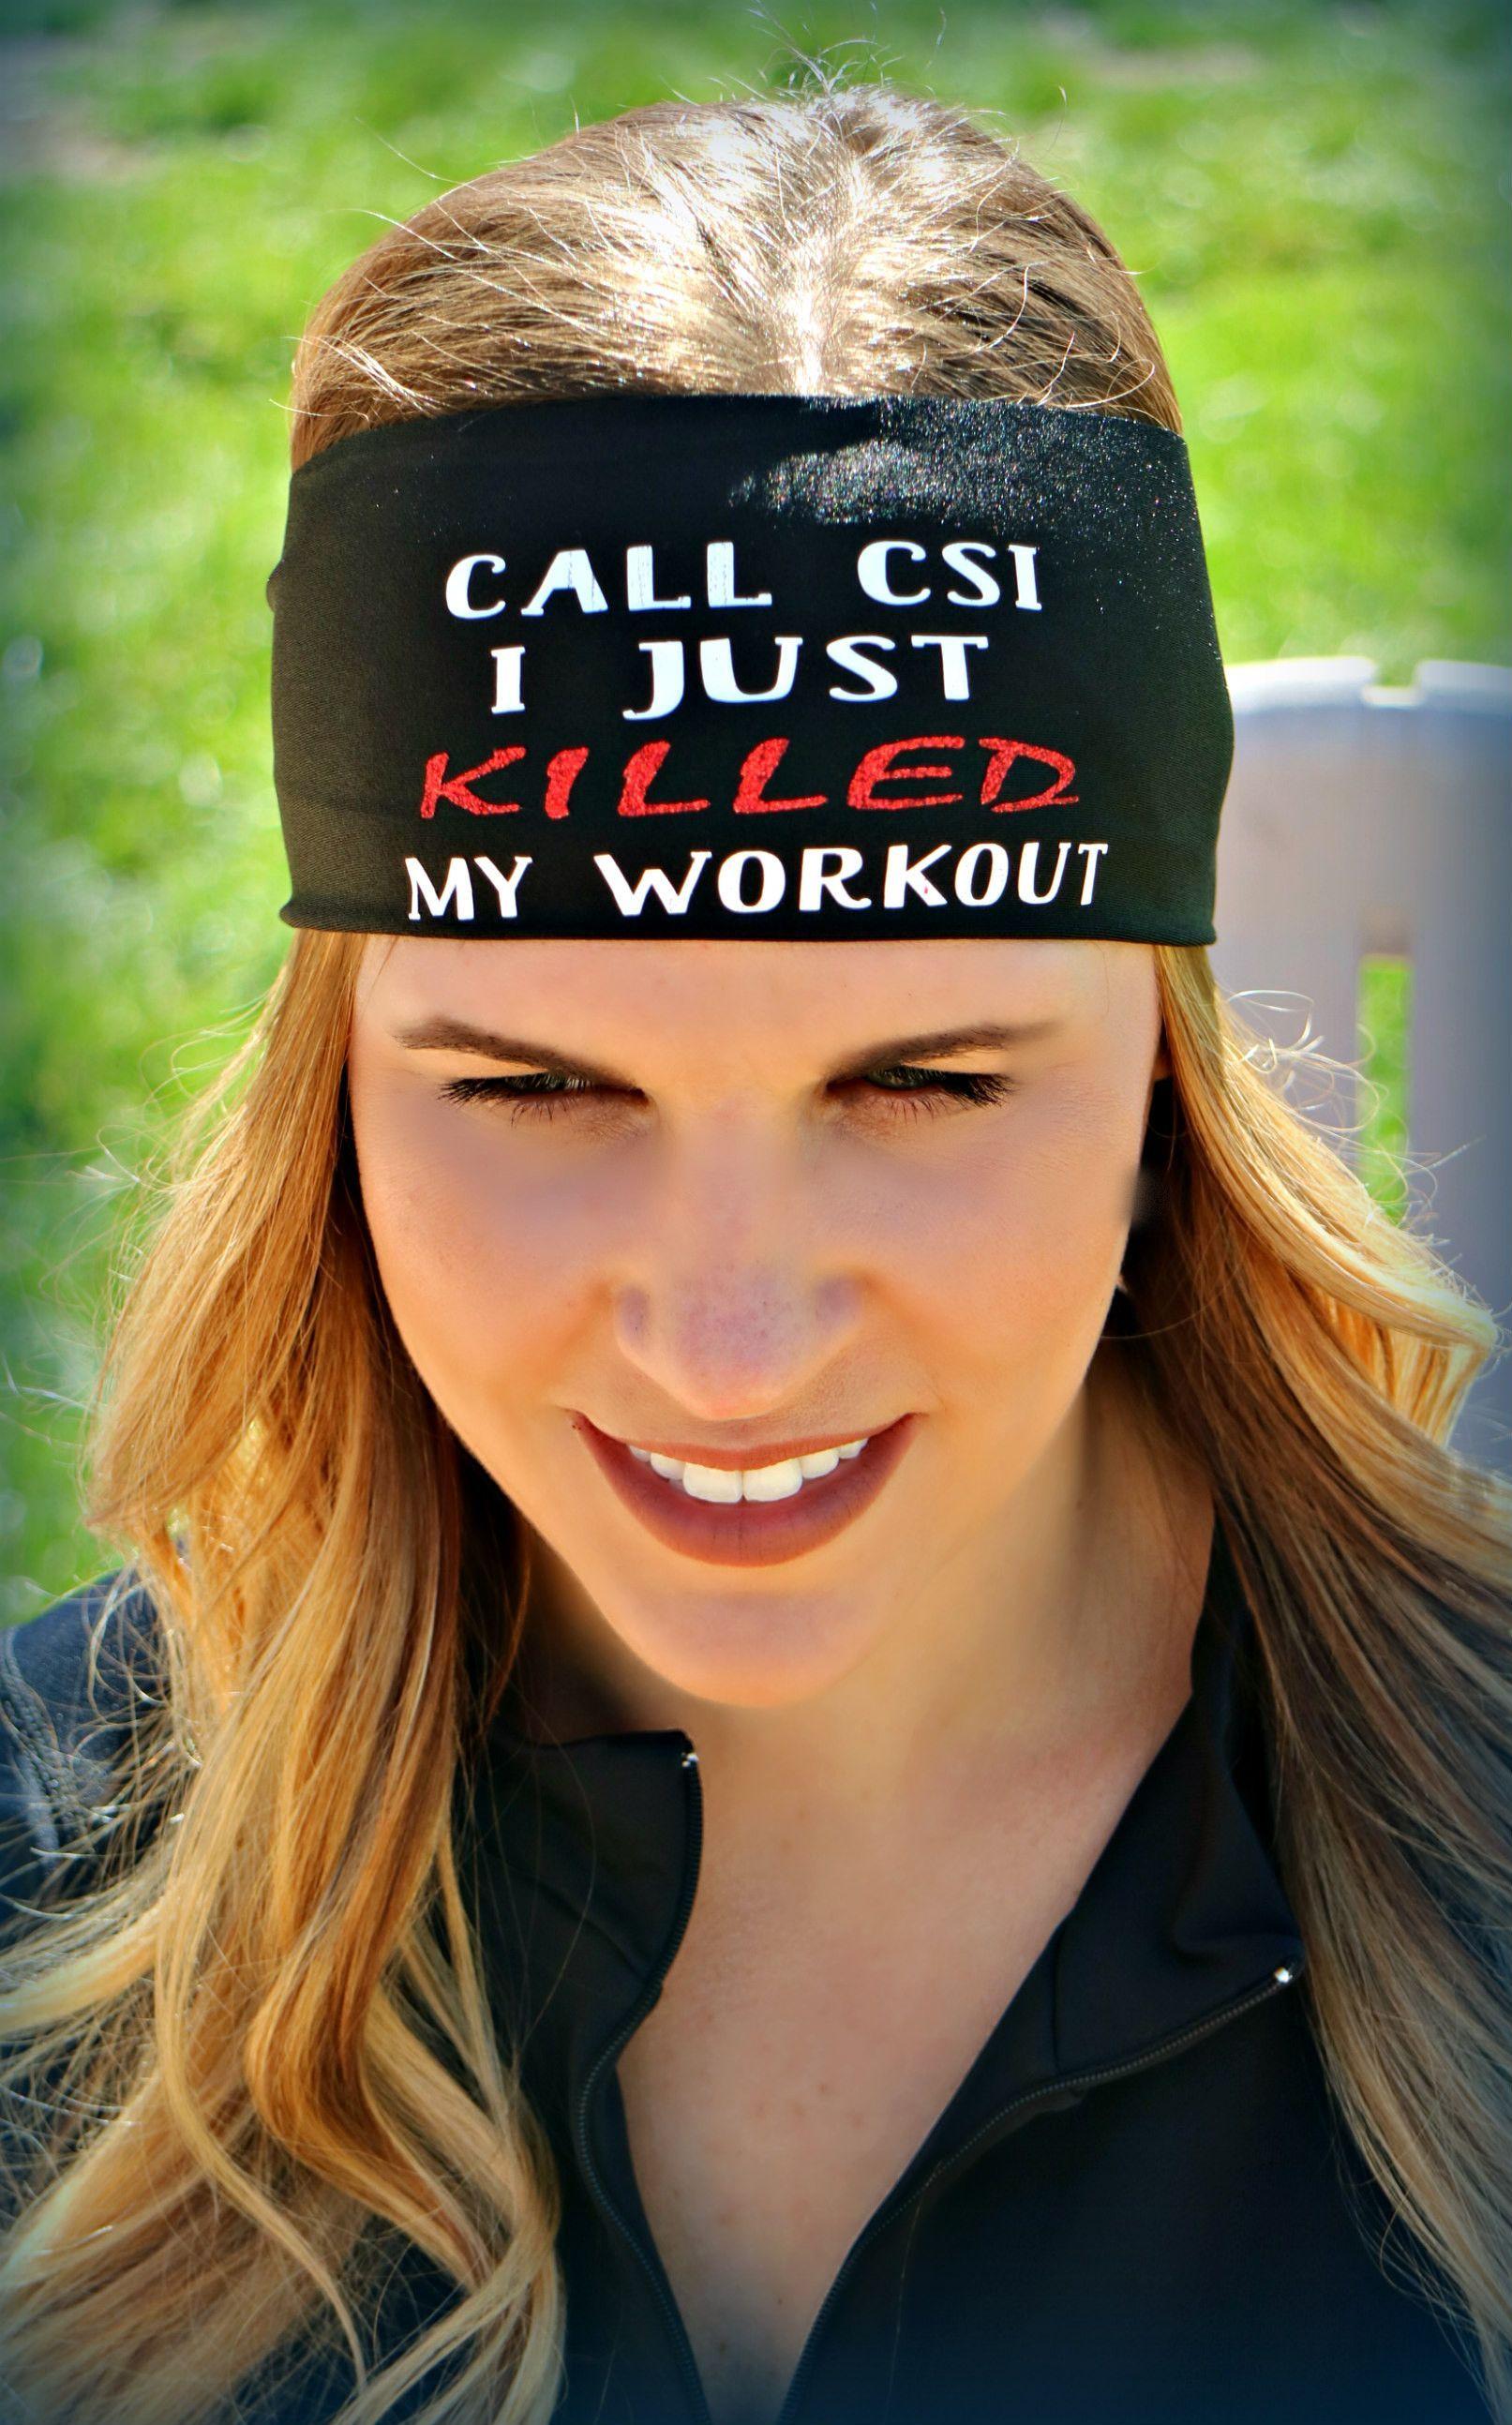 Call csi i just killed my workout ravebandz sloganz exclusive